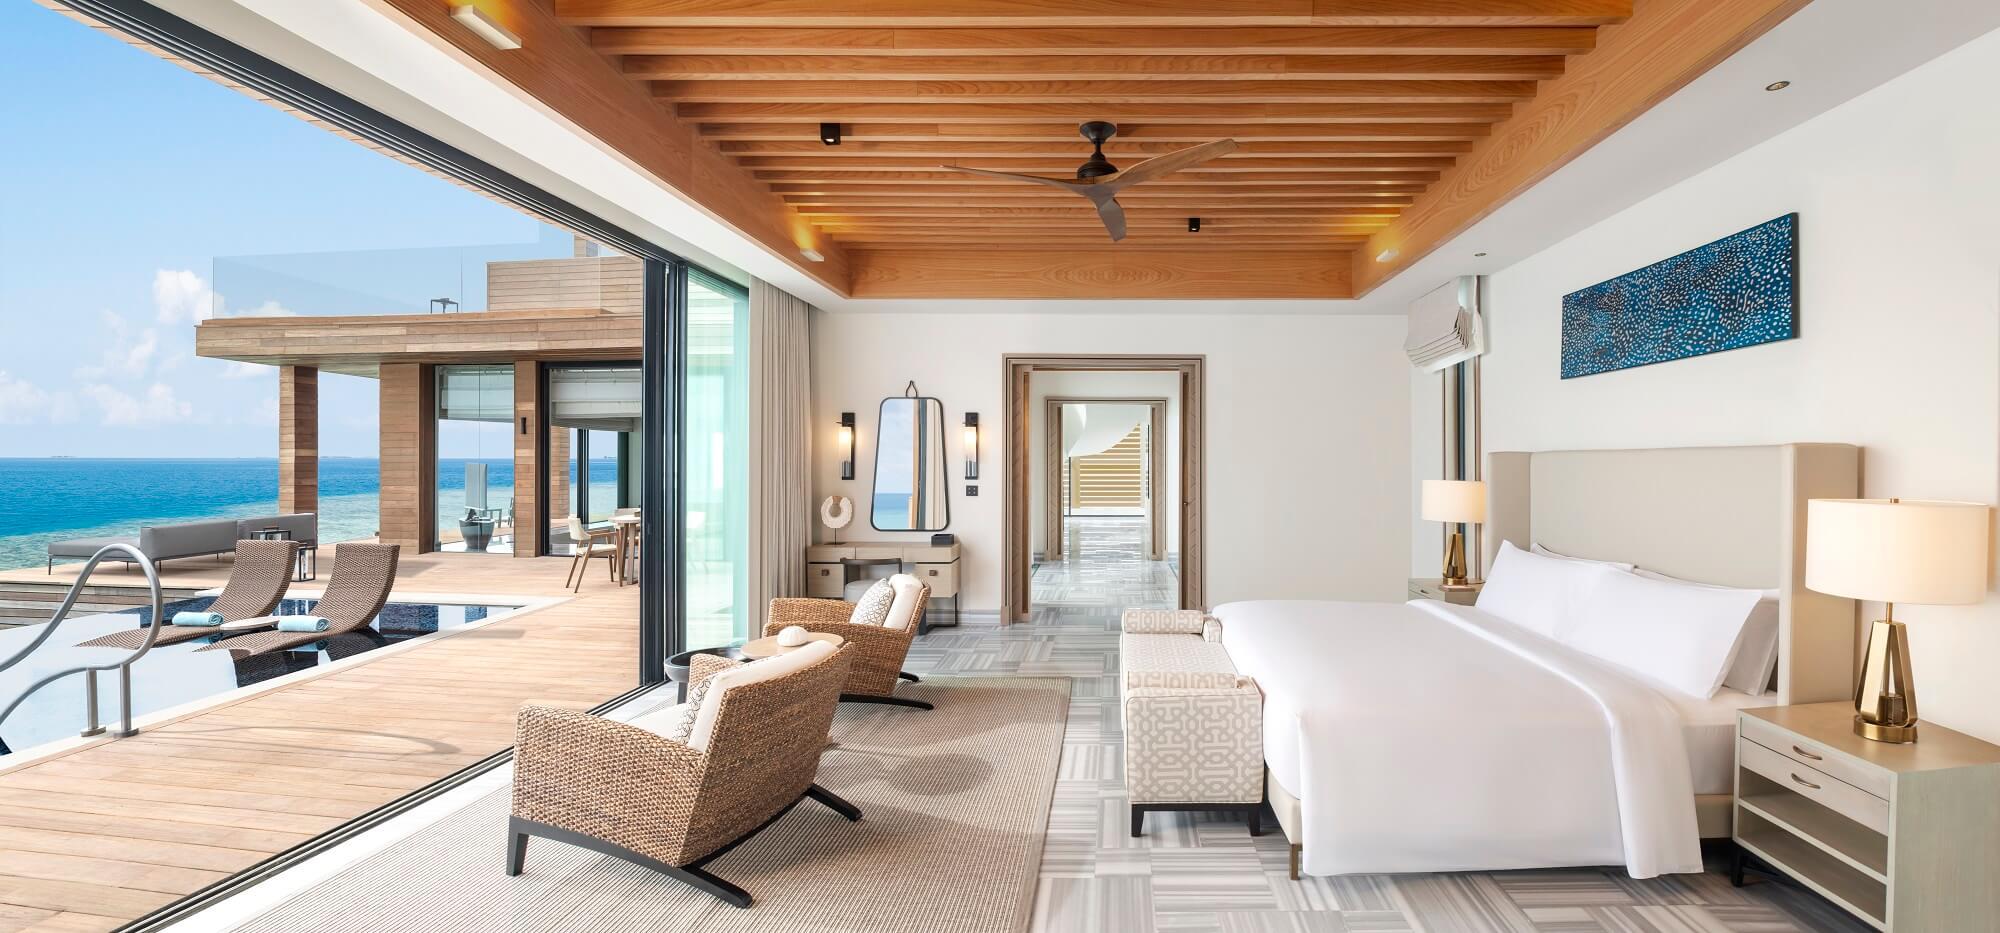 Waldorf Astoria Maldives Stella Maris Bedroom